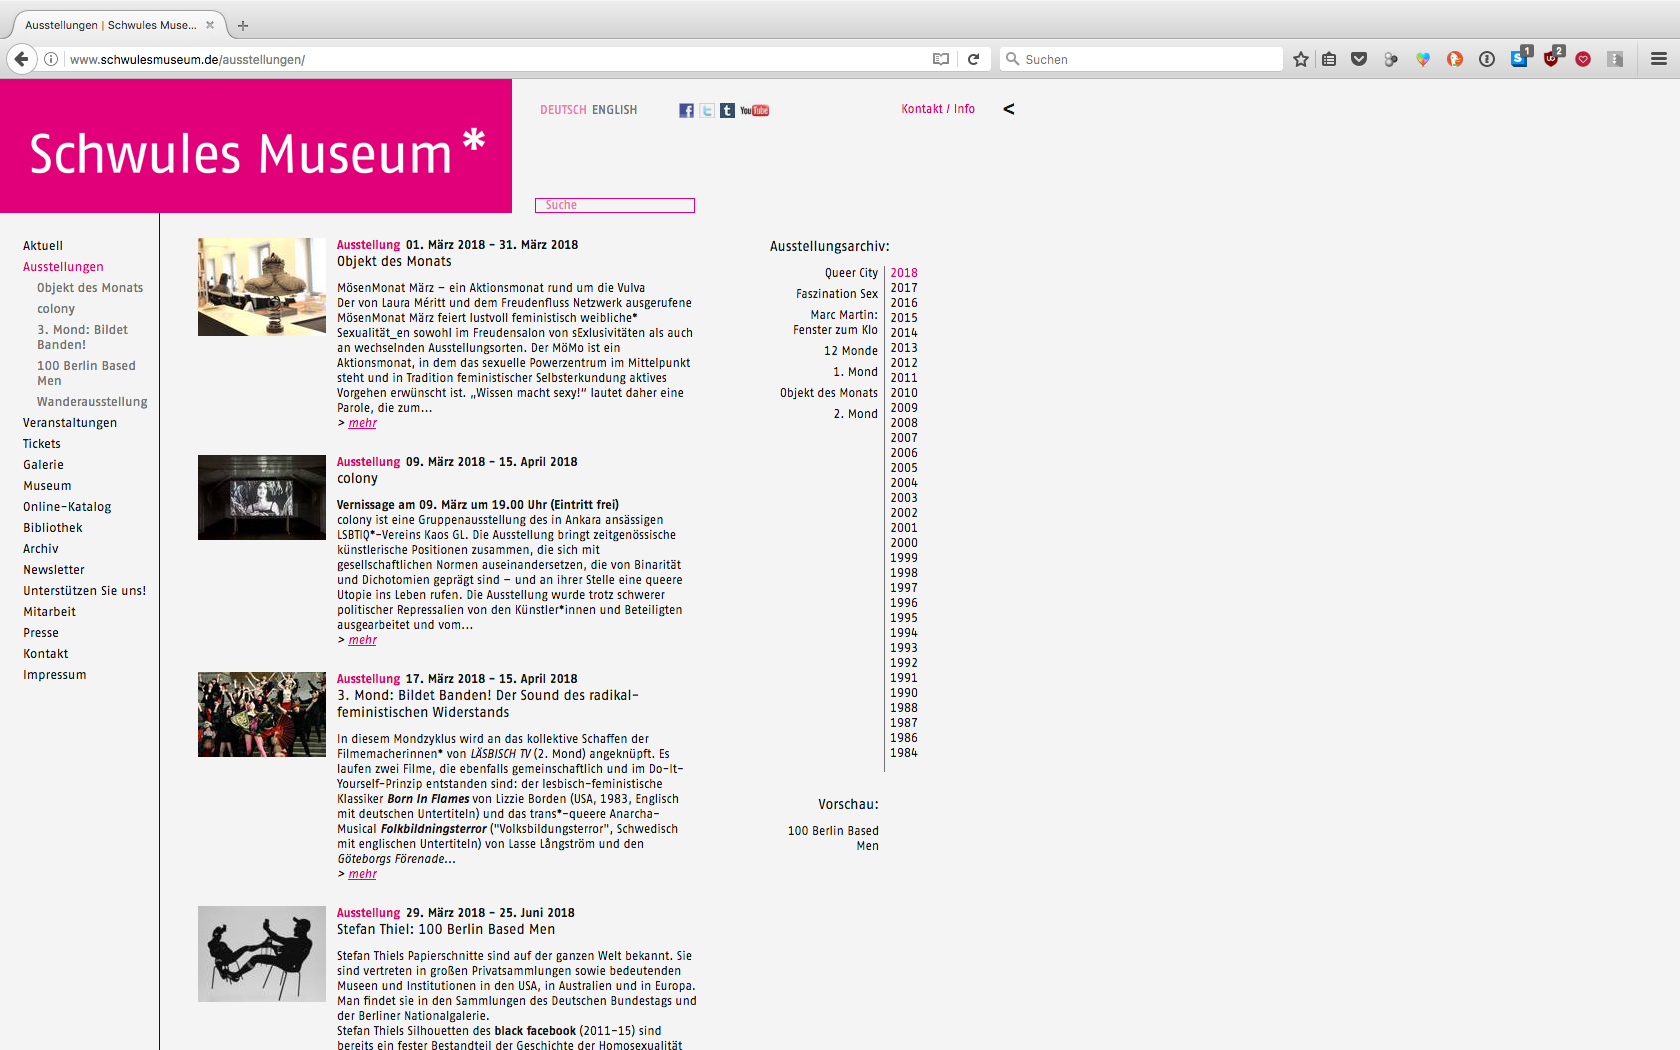 VERA HOFMANN — Schwules Museum Corporate Design